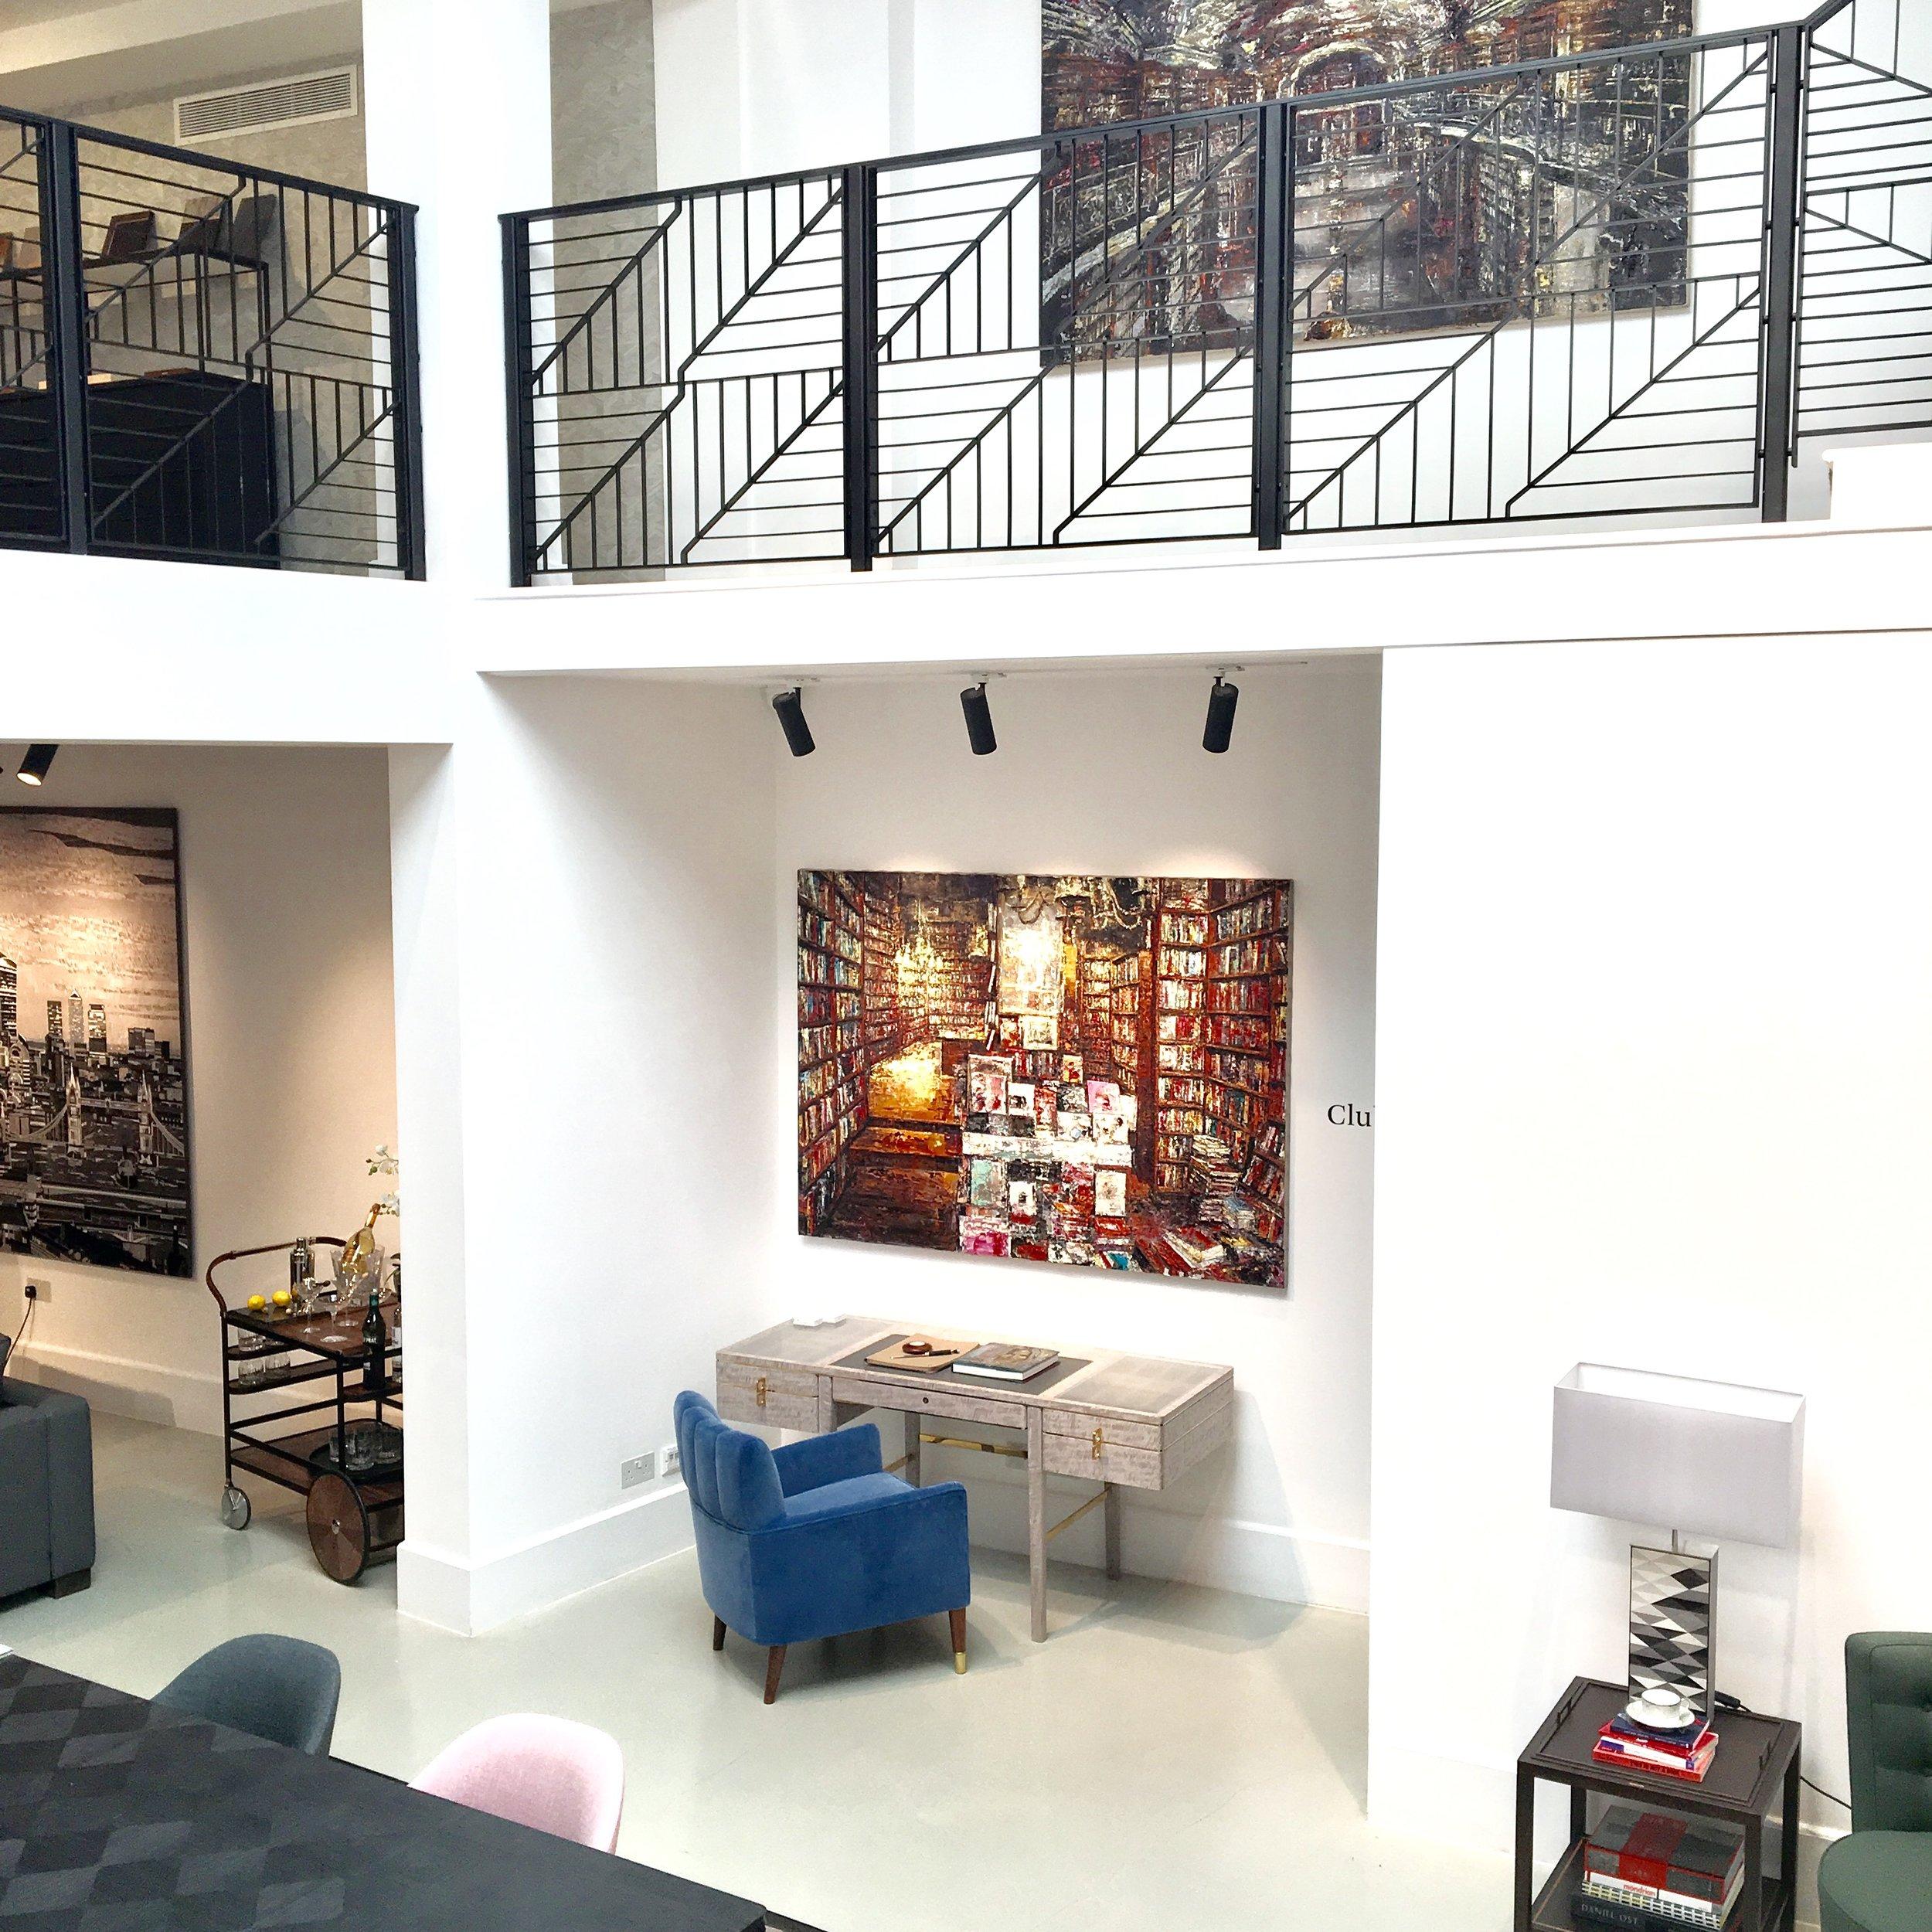 Massimo-Giannoni-Exhibition-Photo-1-Linley-London-Ransom-Art-Collaboration.jpg